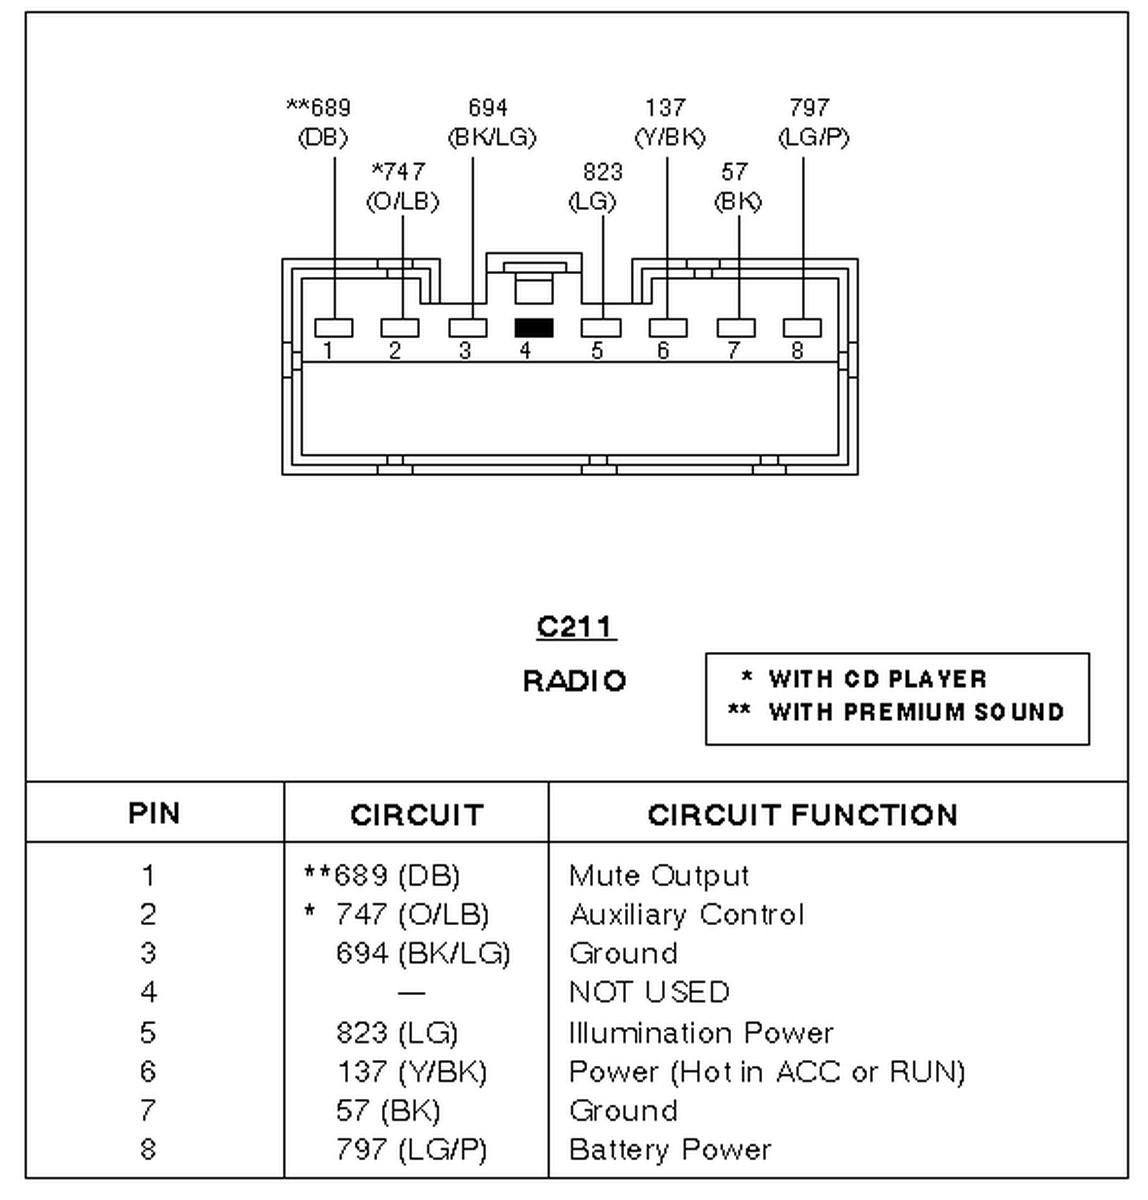 hight resolution of 1995 ford f150 radio wiring diagram free wiring diagram1995 ford f150 radio wiring diagram